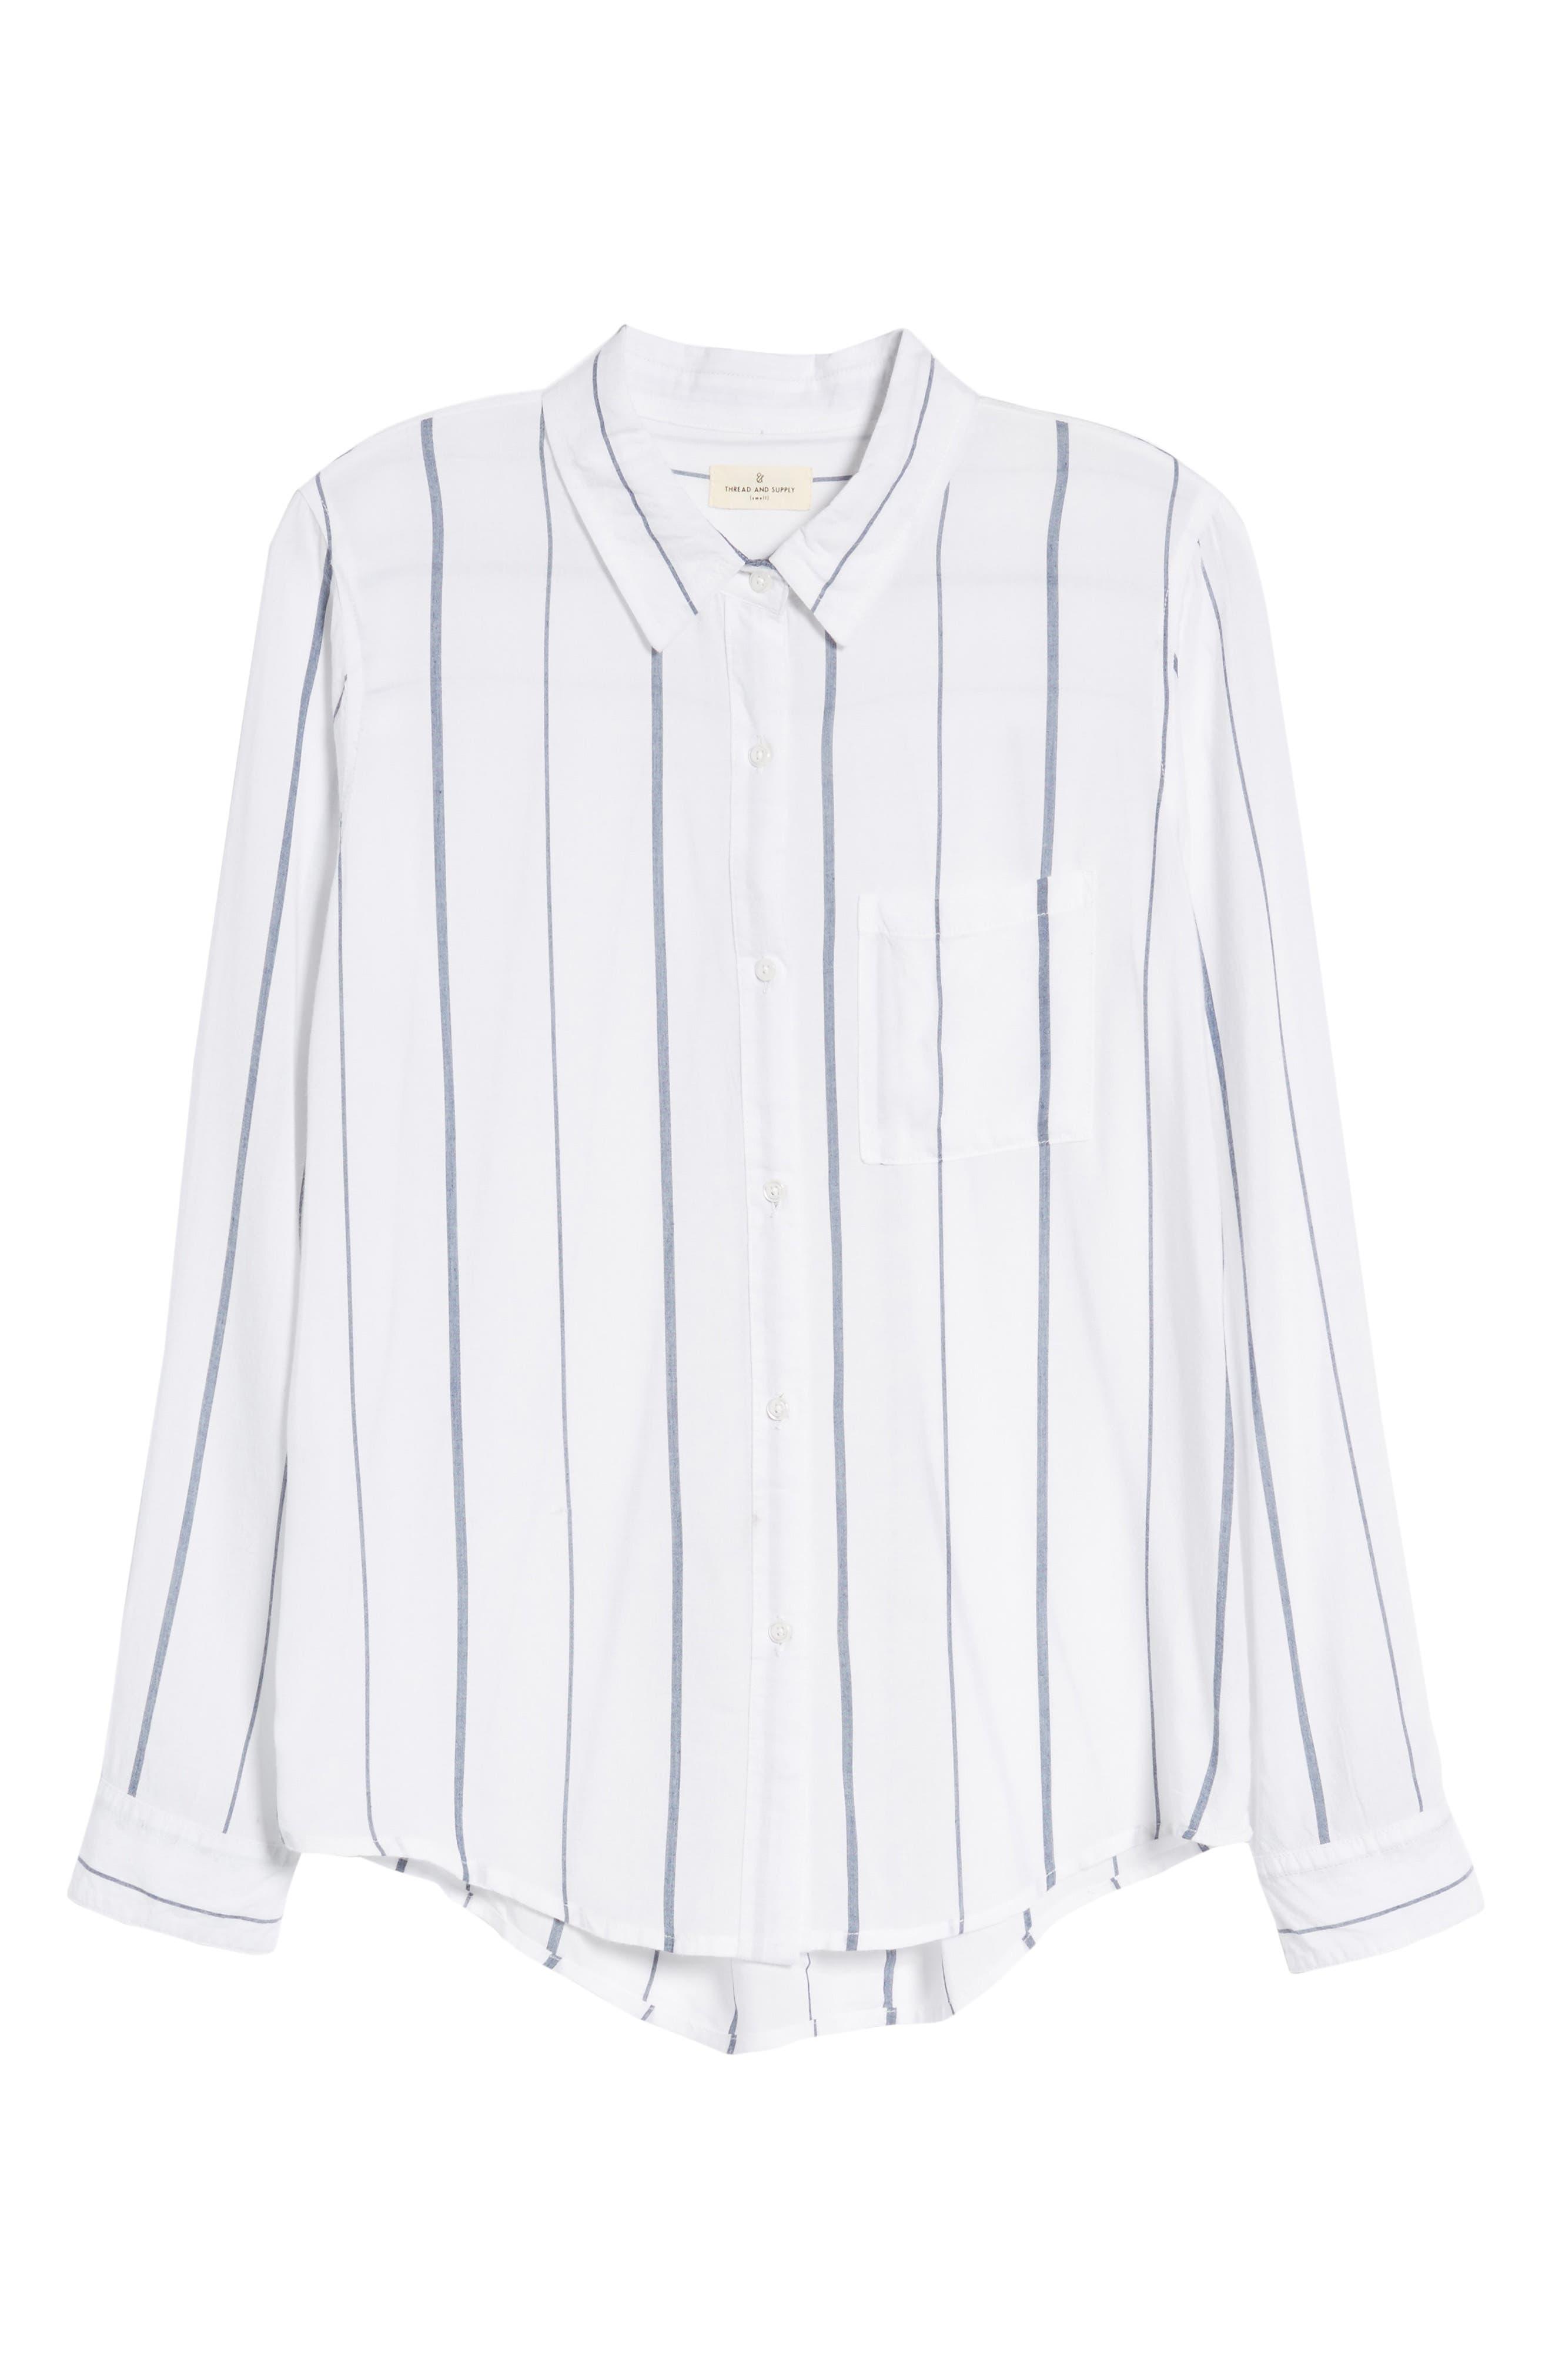 Canyons Stripe Shirt,                             Alternate thumbnail 6, color,                             100